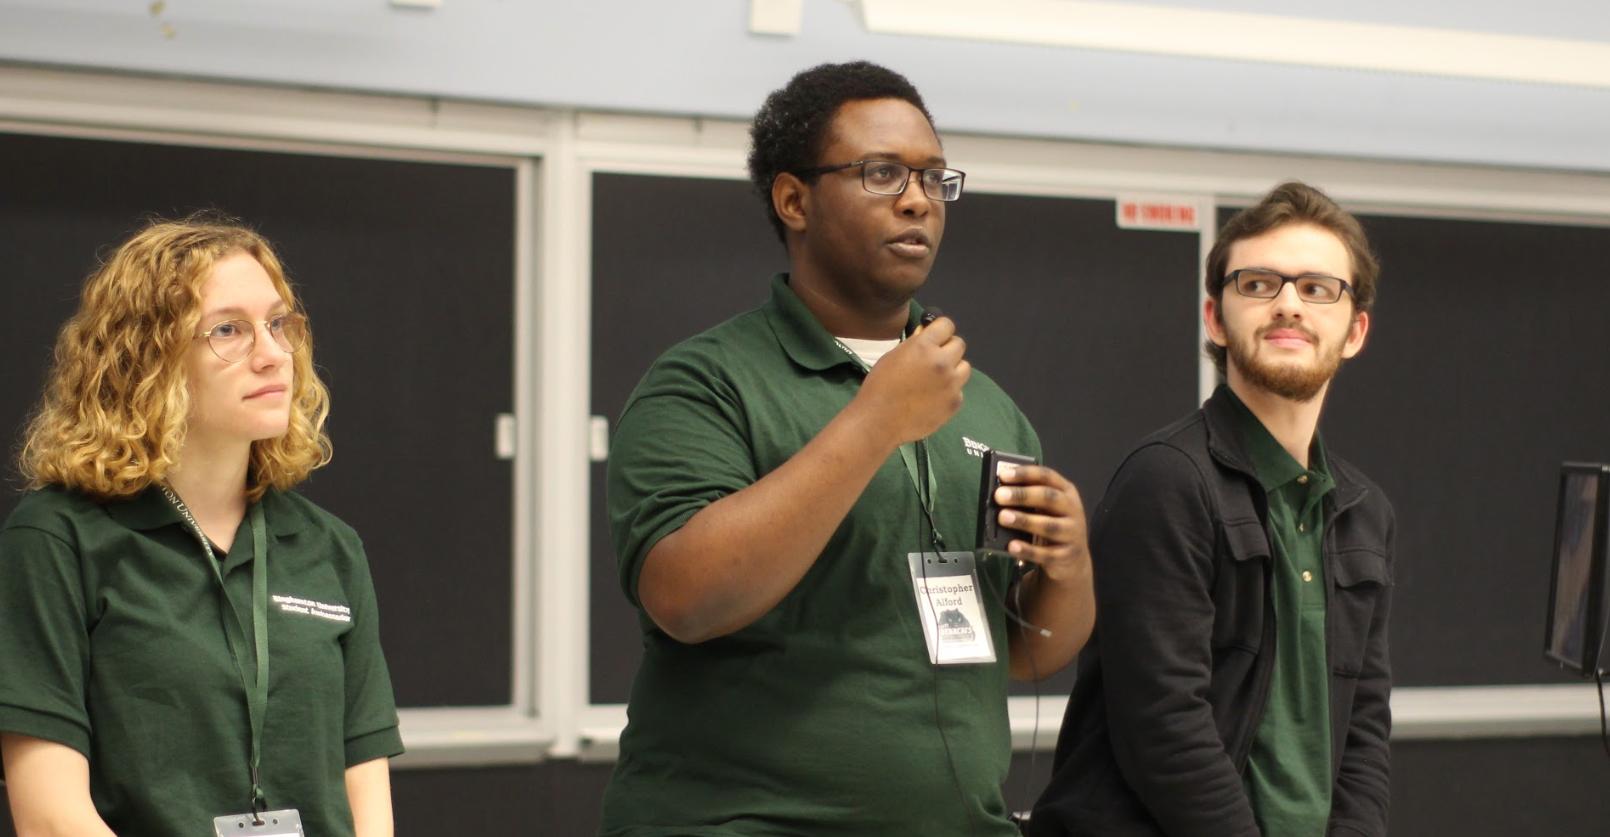 Binghamton University Student Ambassador Event Training